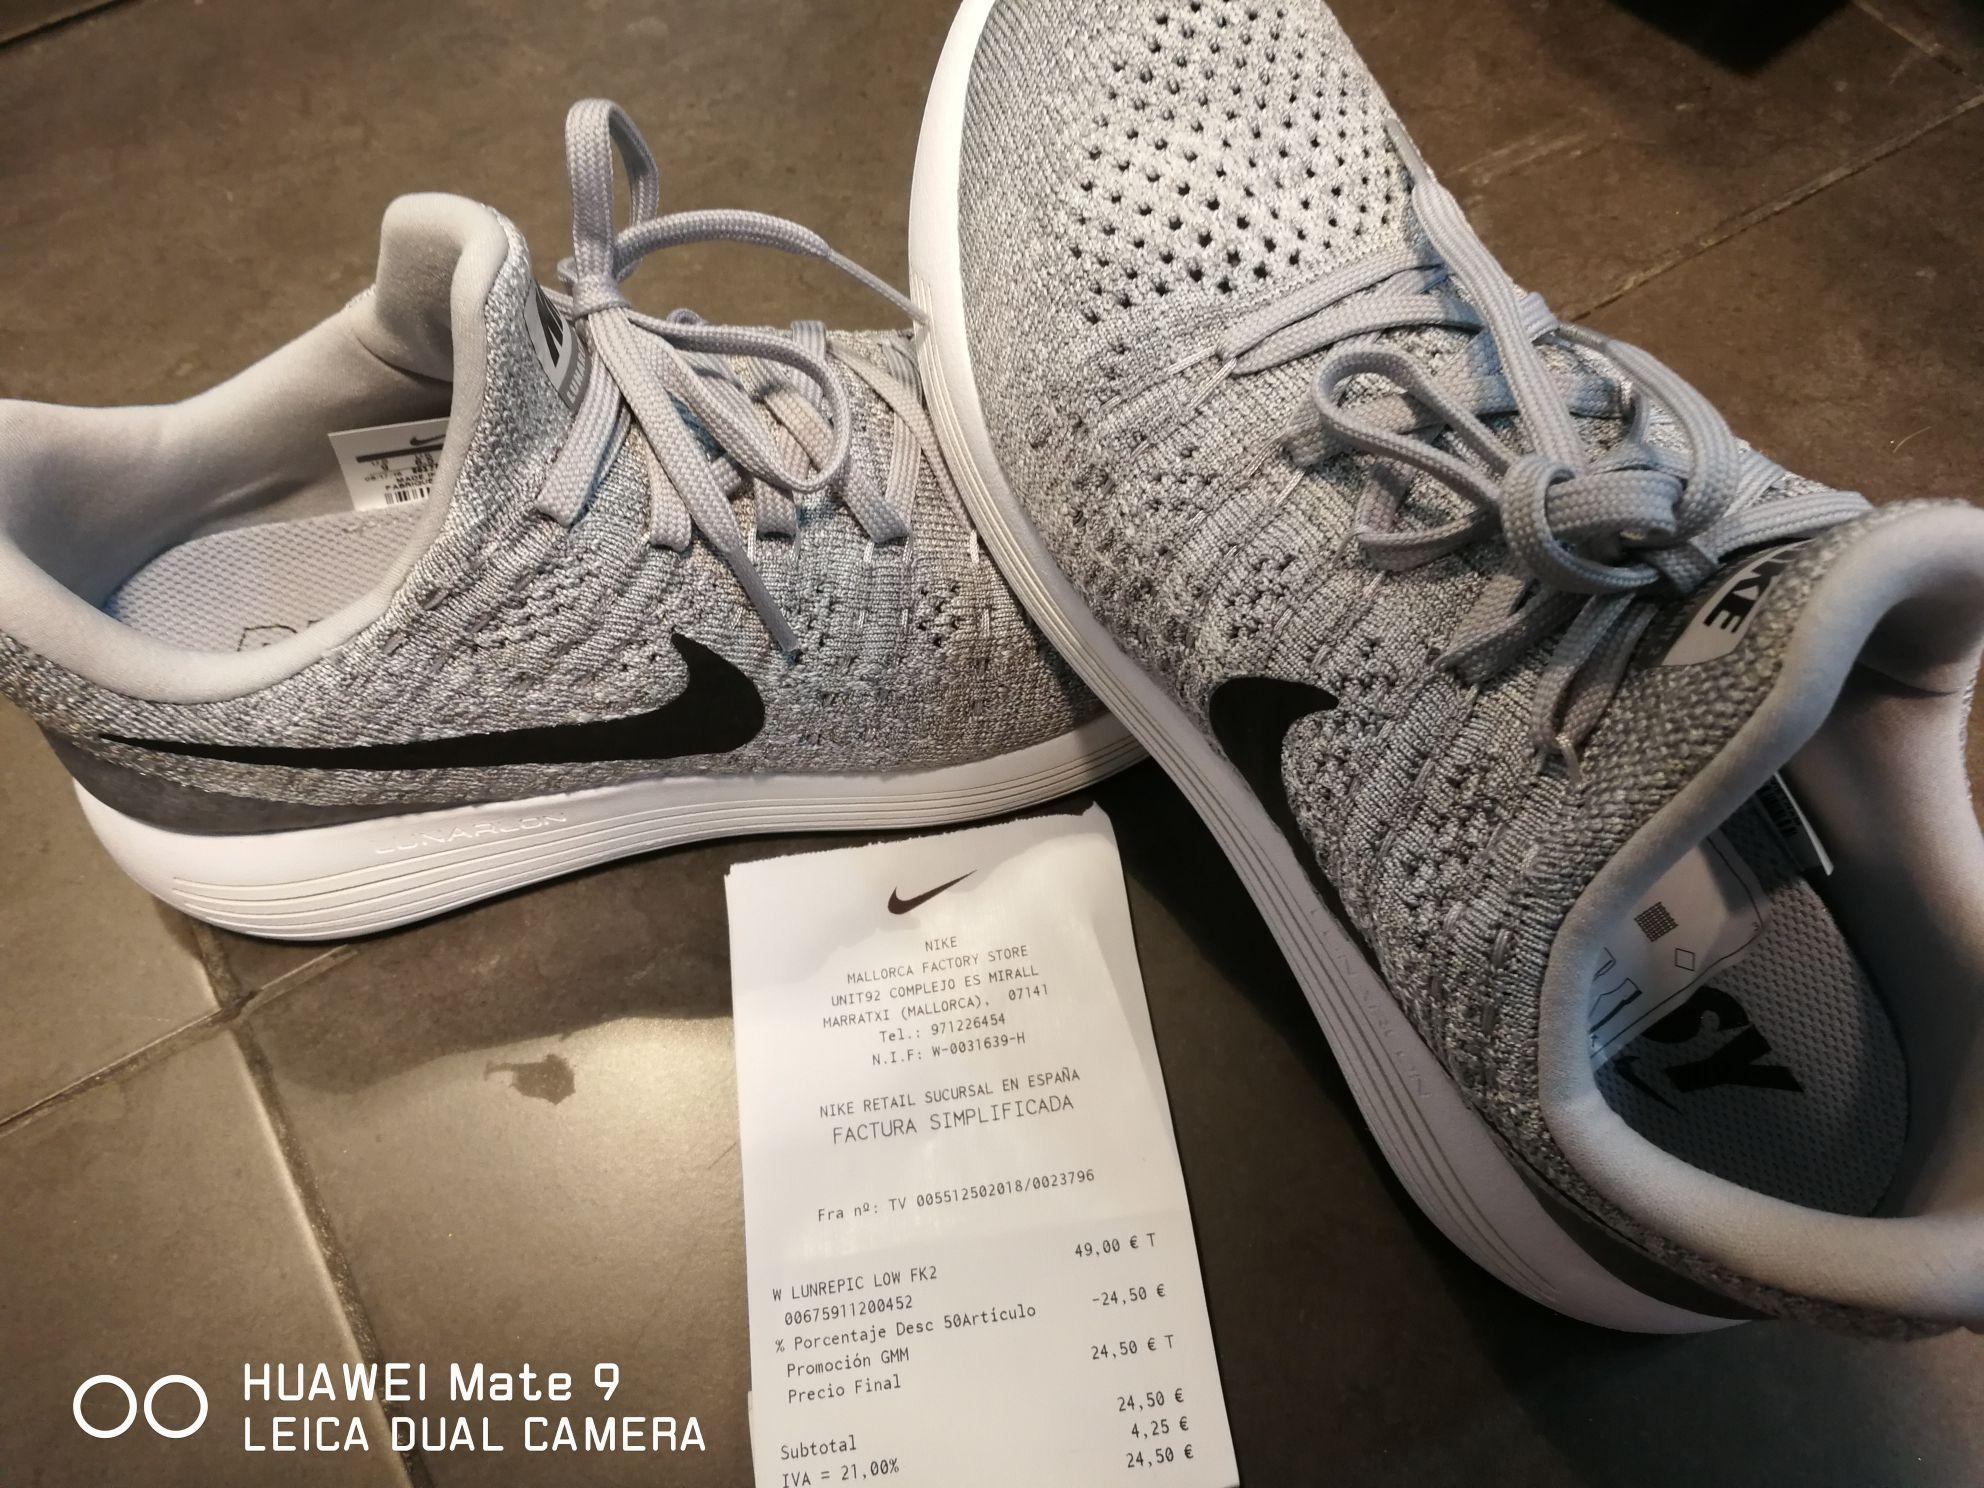 Nike lunarepic Wmns varias tallas 24.5€